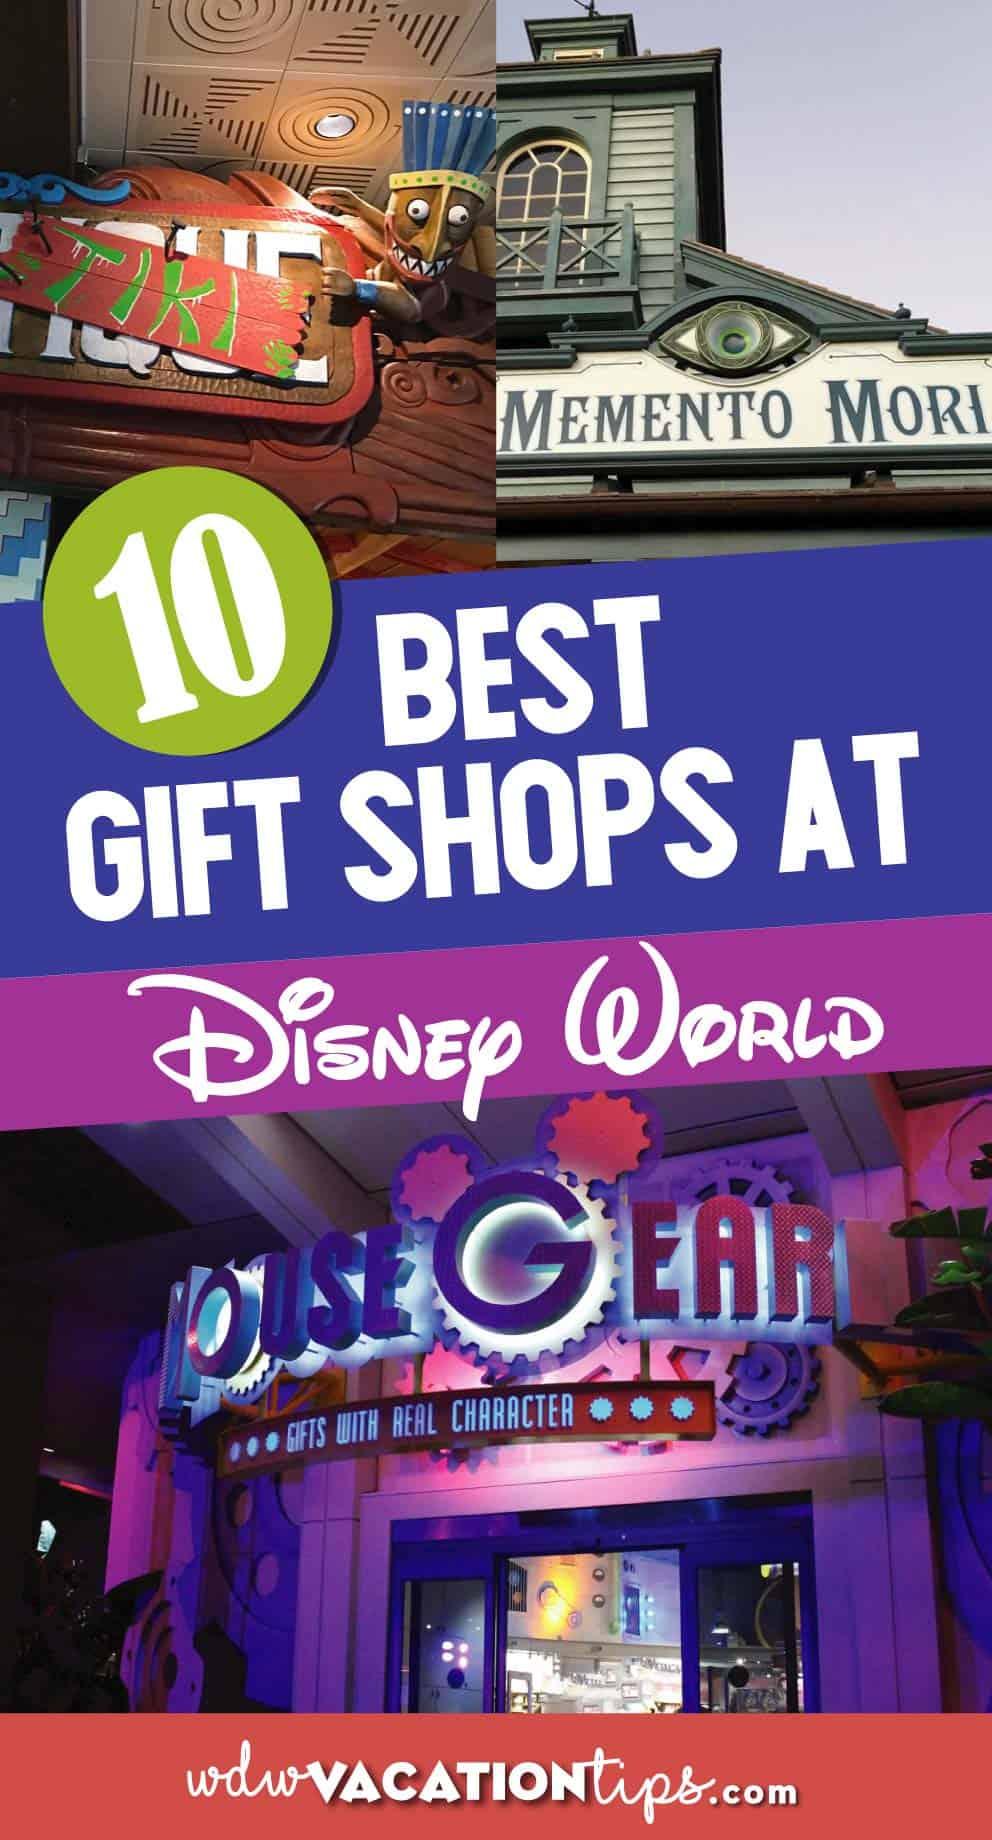 Best Gift Shops at Disney World